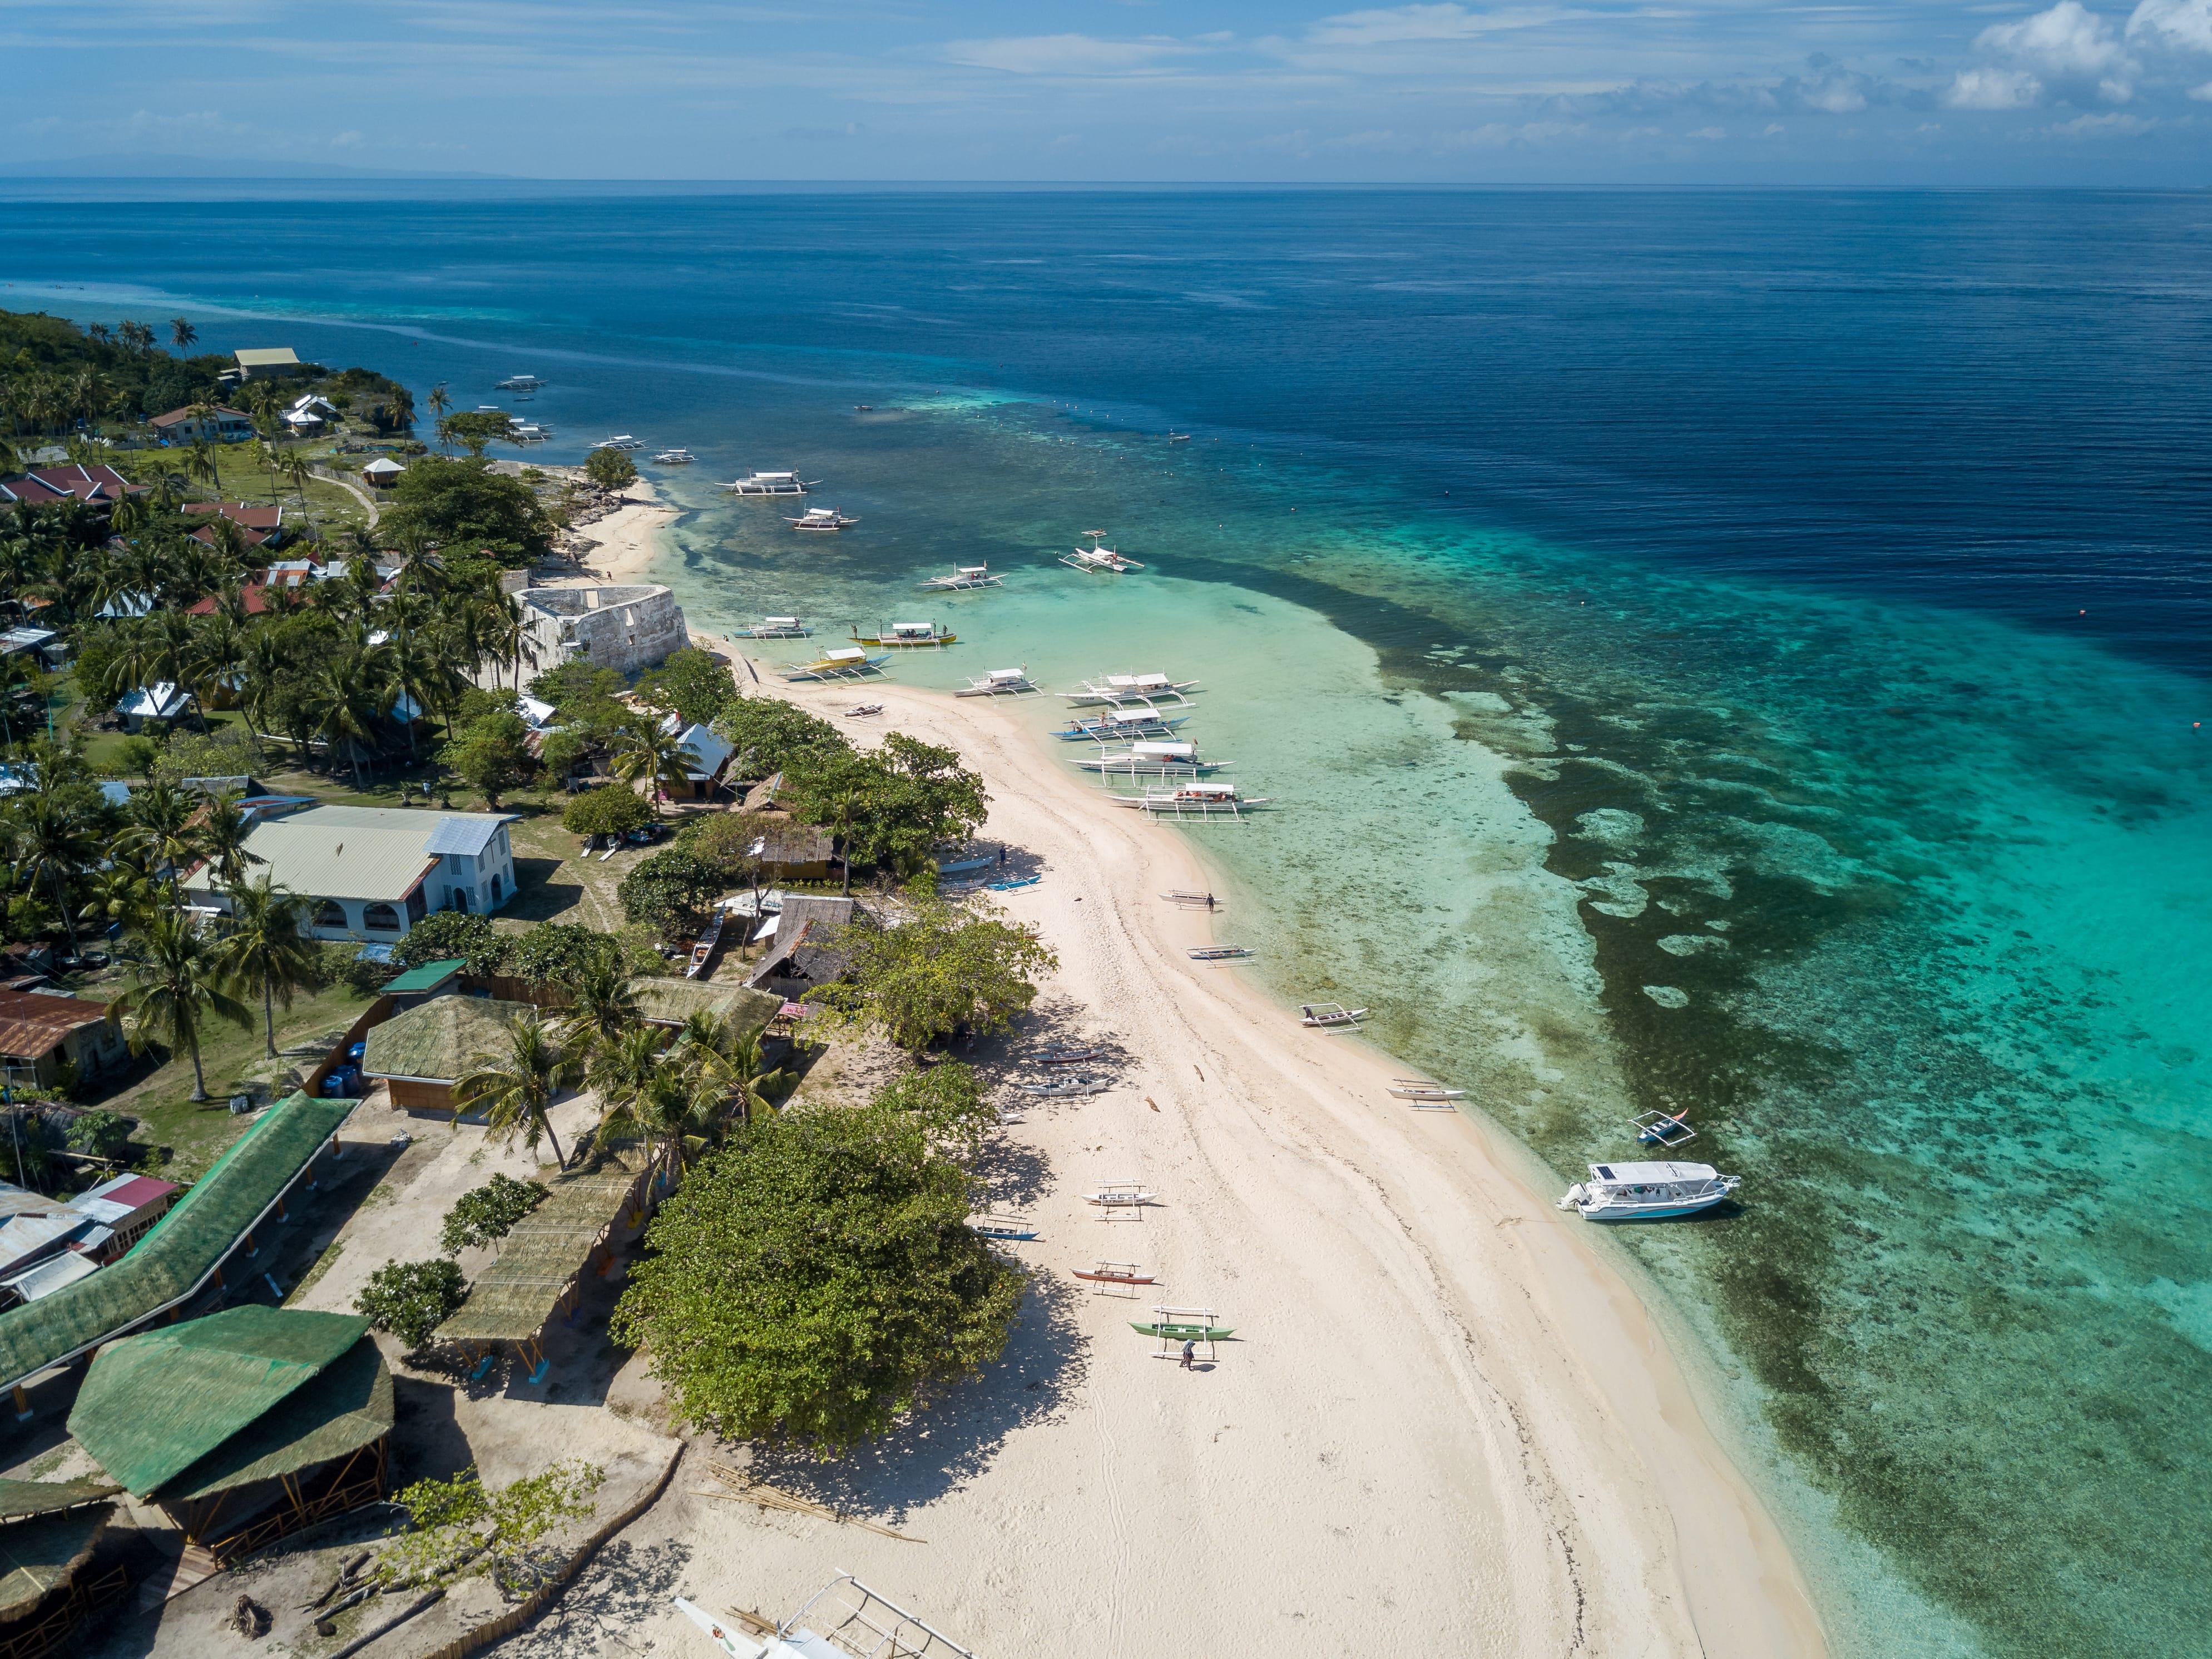 White sand beach of Pamilacan Island